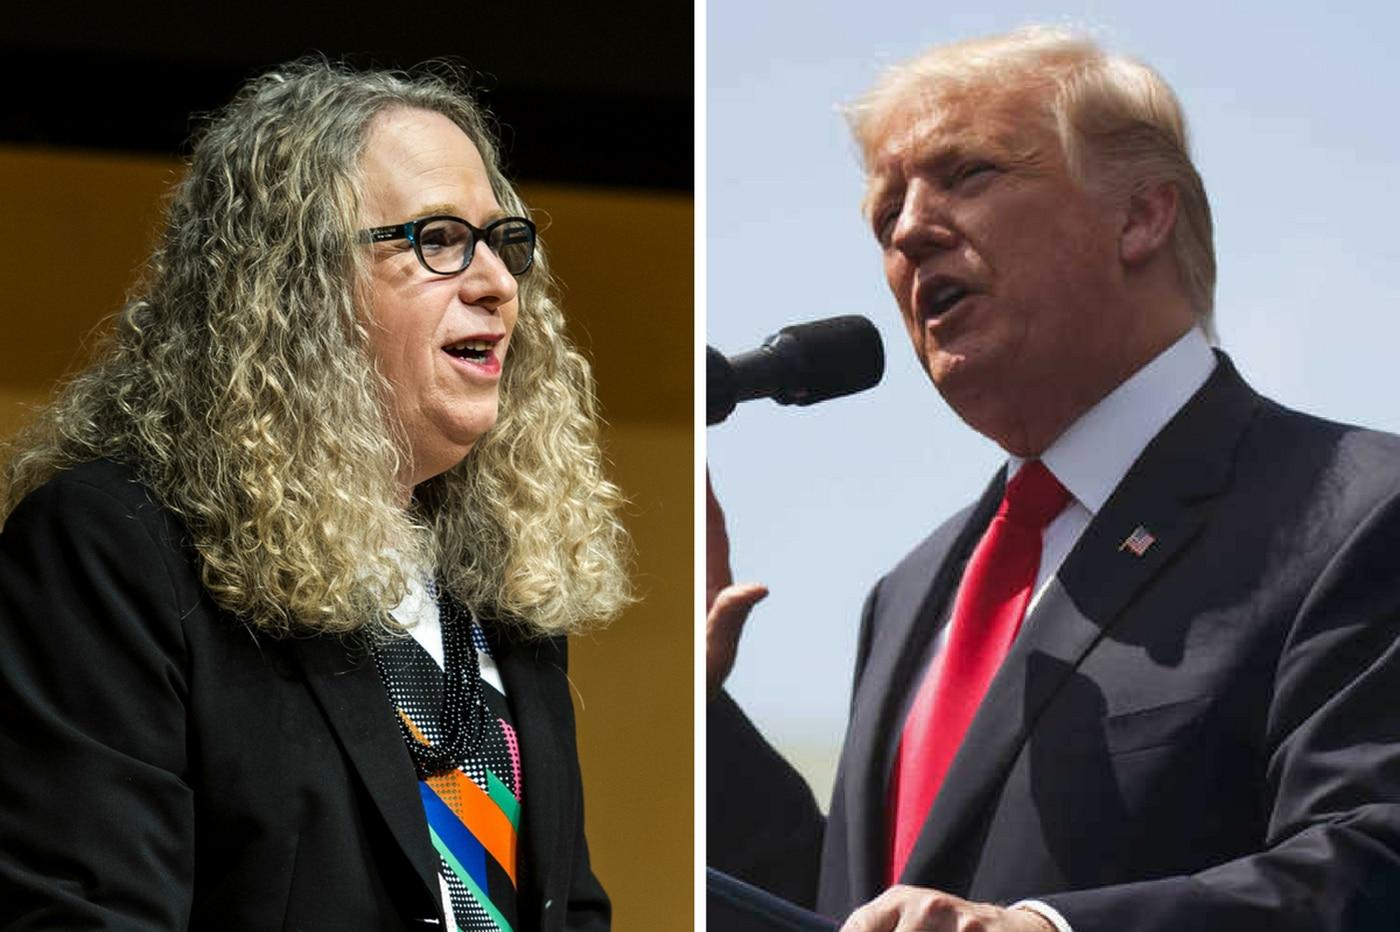 Trump's transgender military ban is mean-spirited, bigoted ...